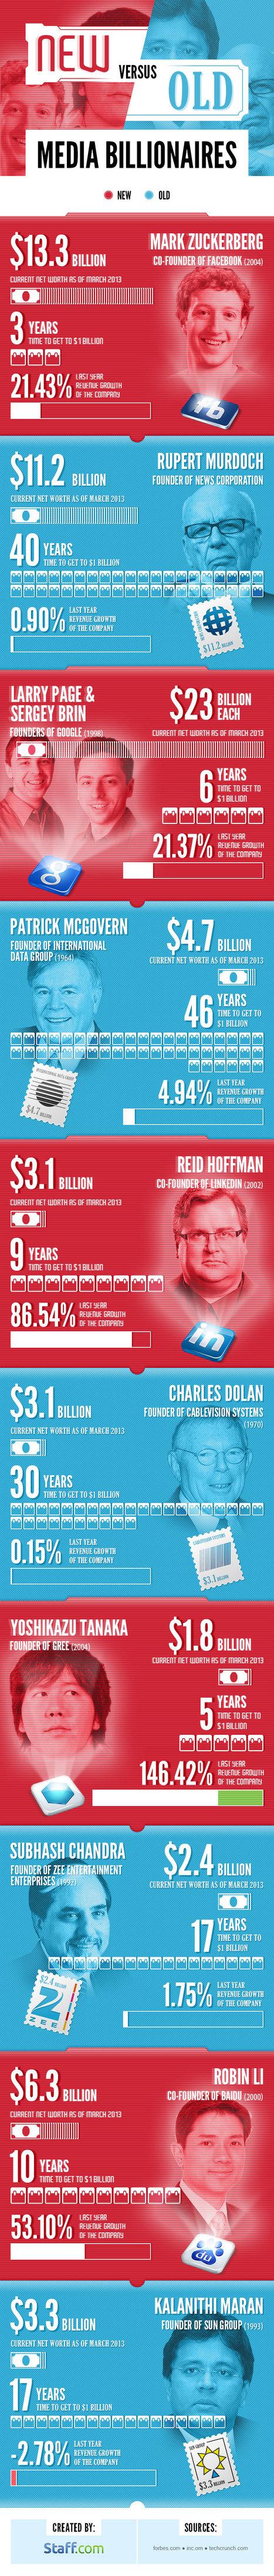 New Media vs Old Media Billionaires #infographic | Ice Cool Infographics | Scoop.it